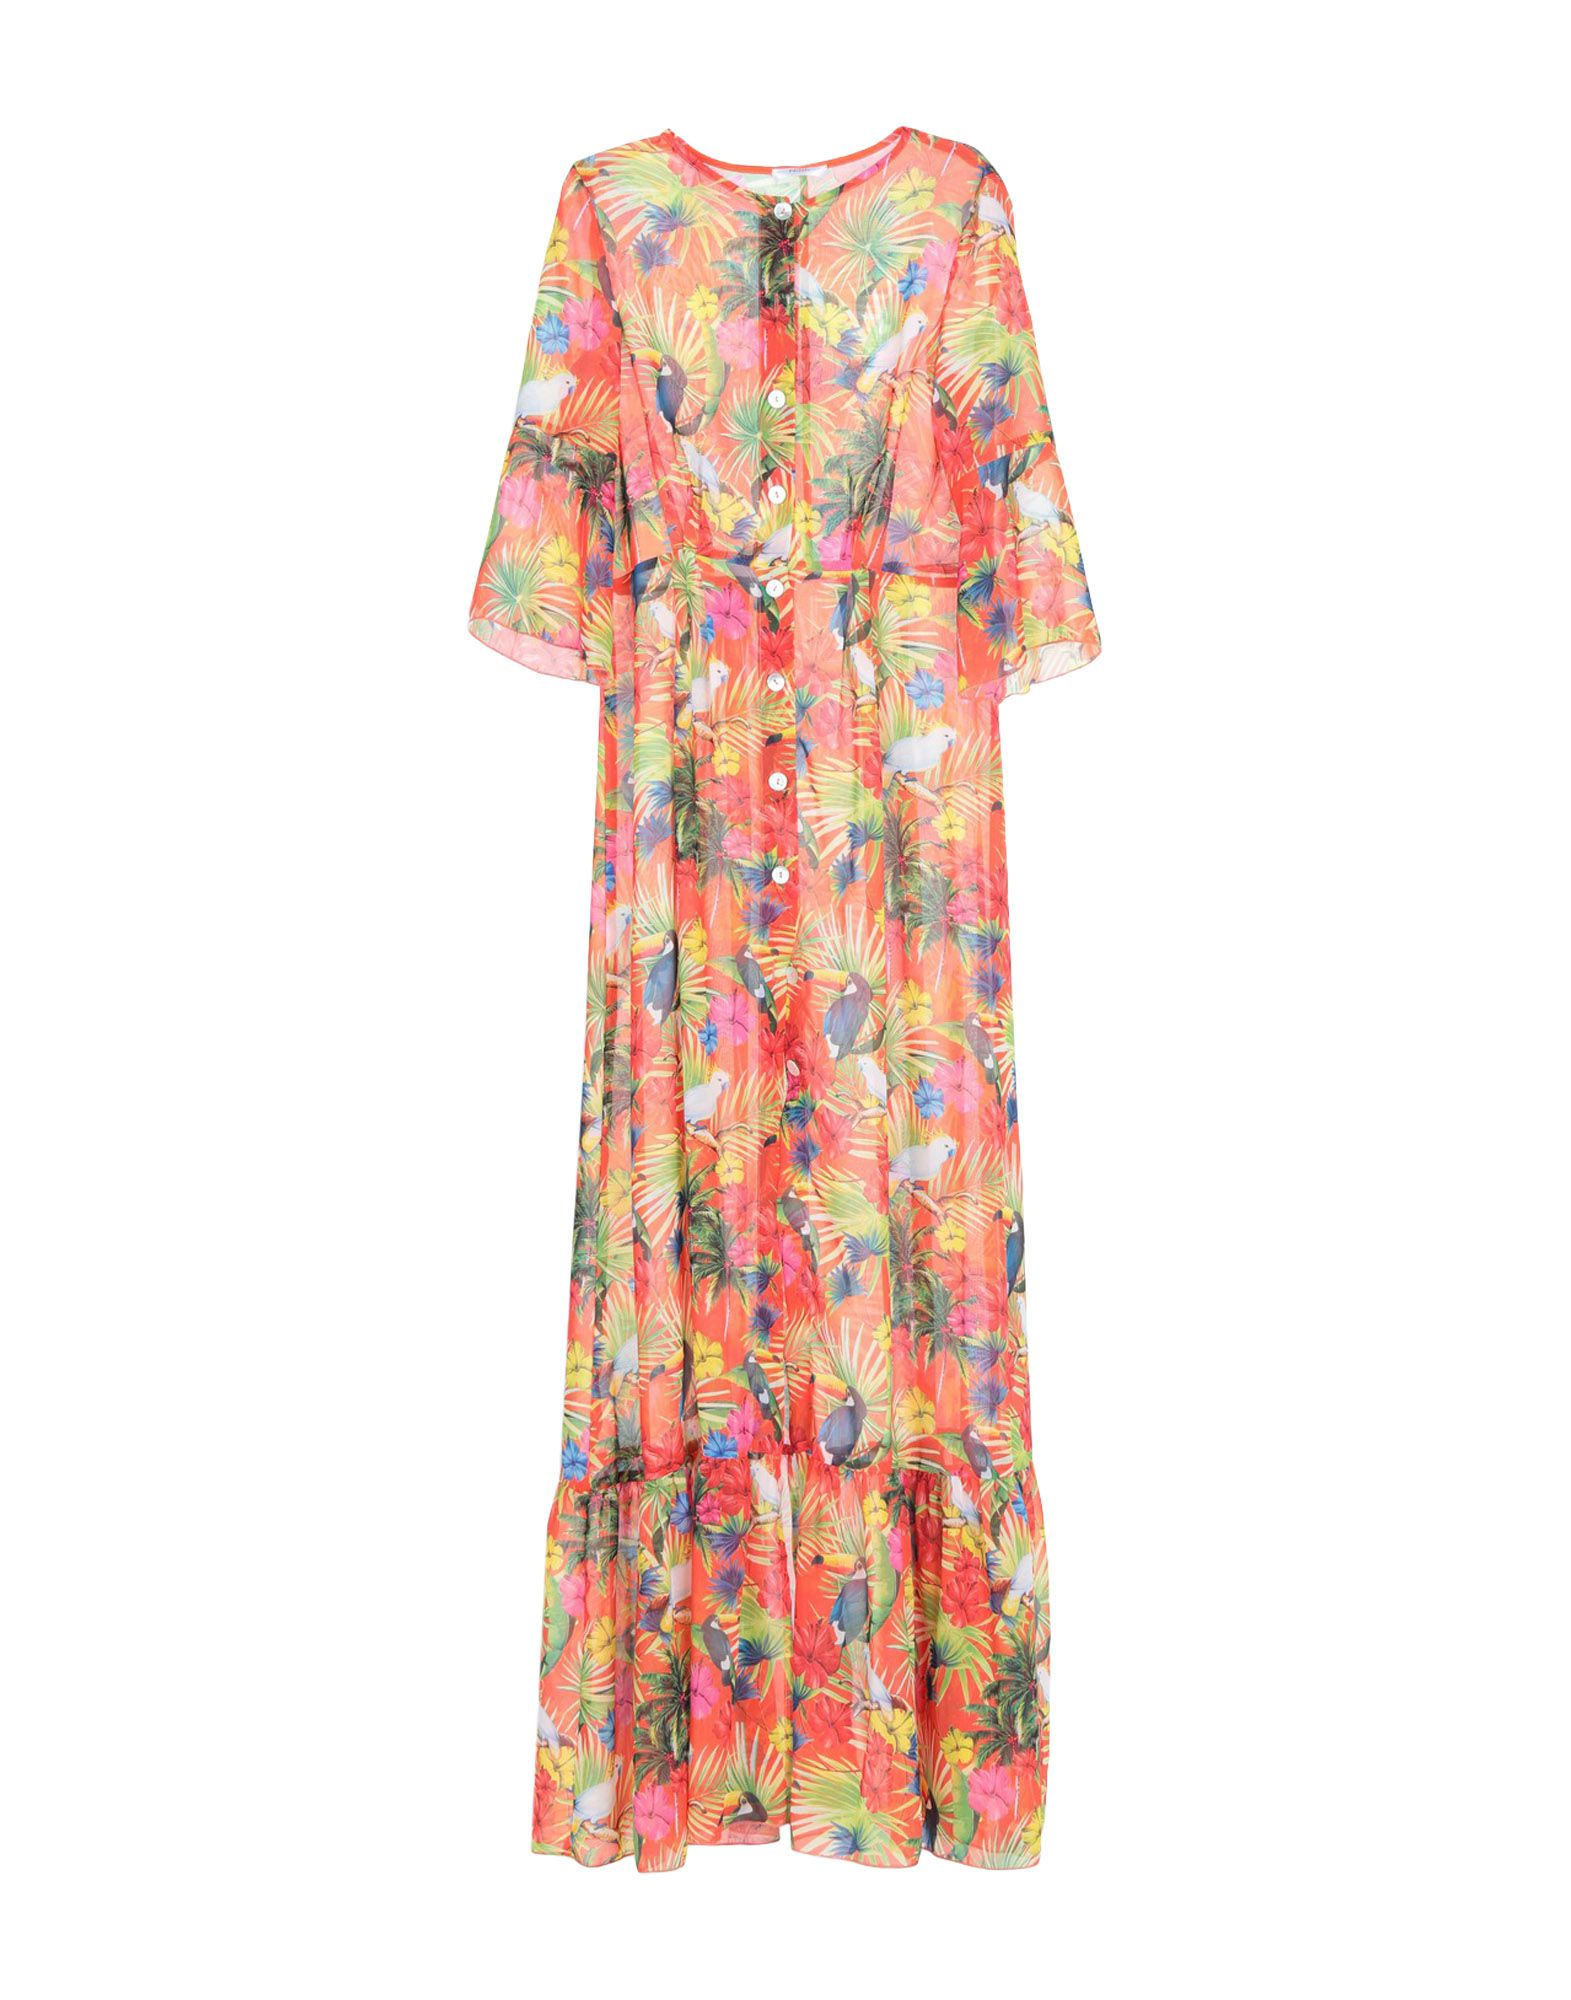 NASH Milano Длинное платье платье рубашка fox yulia sway платье рубашка fox